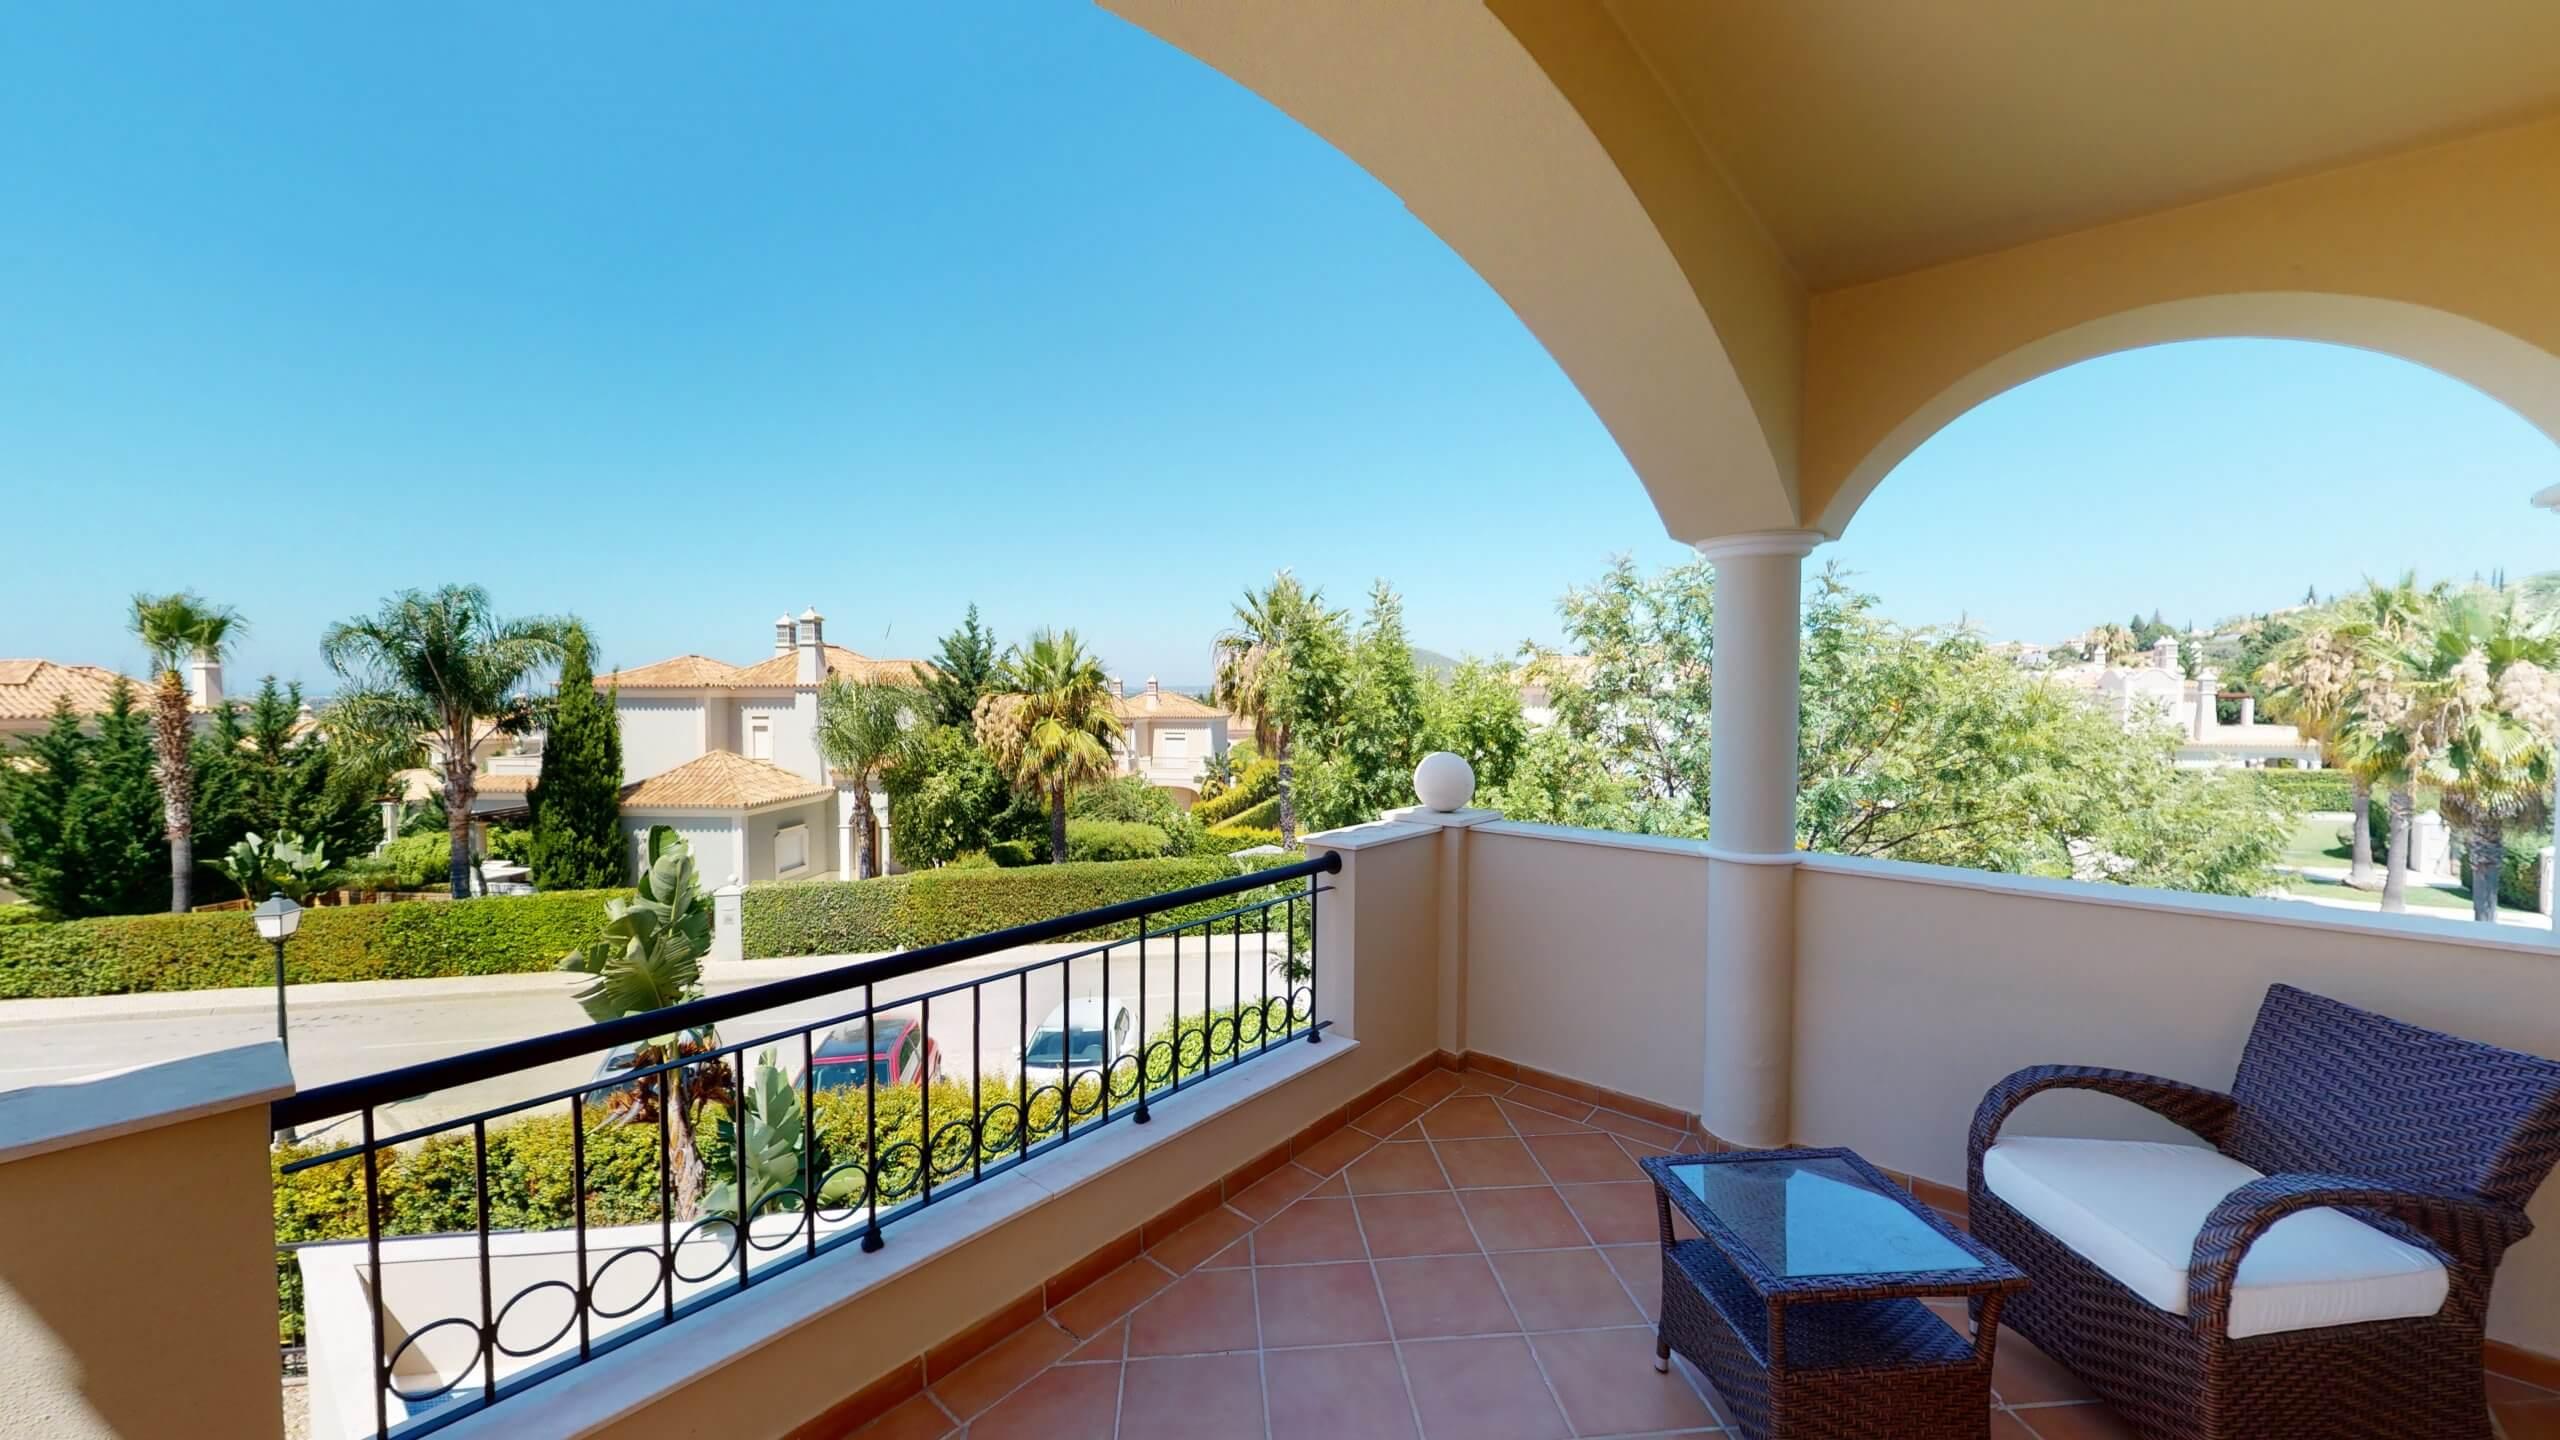 35-The-Crest-by-Trinity-Algarve-07032020_114322